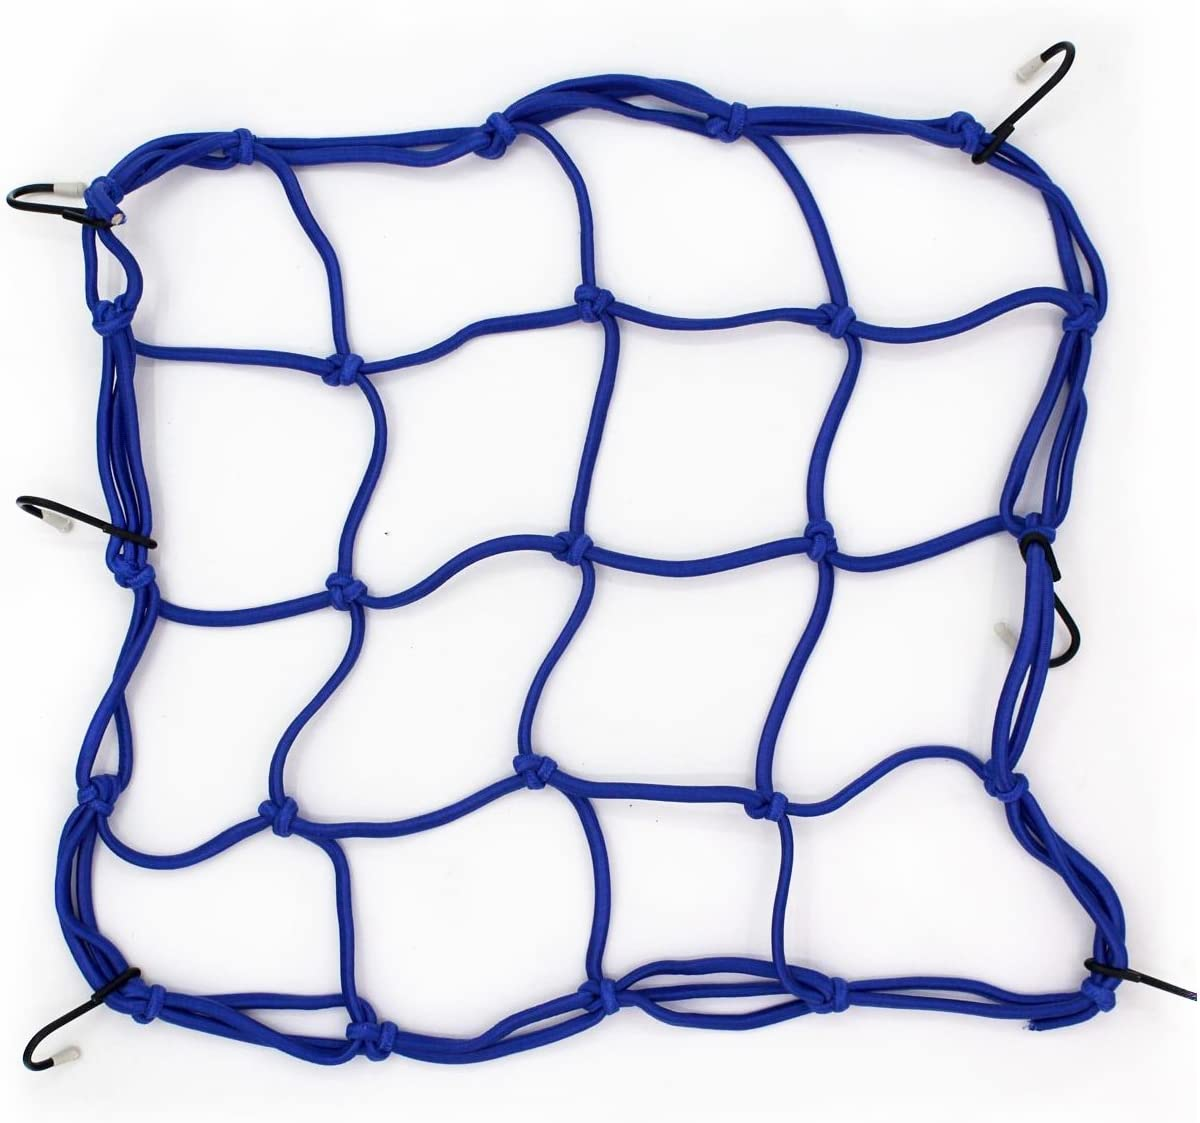 Wild.lifebicycle Bungie Cargo Net 11''X11'' 19-19